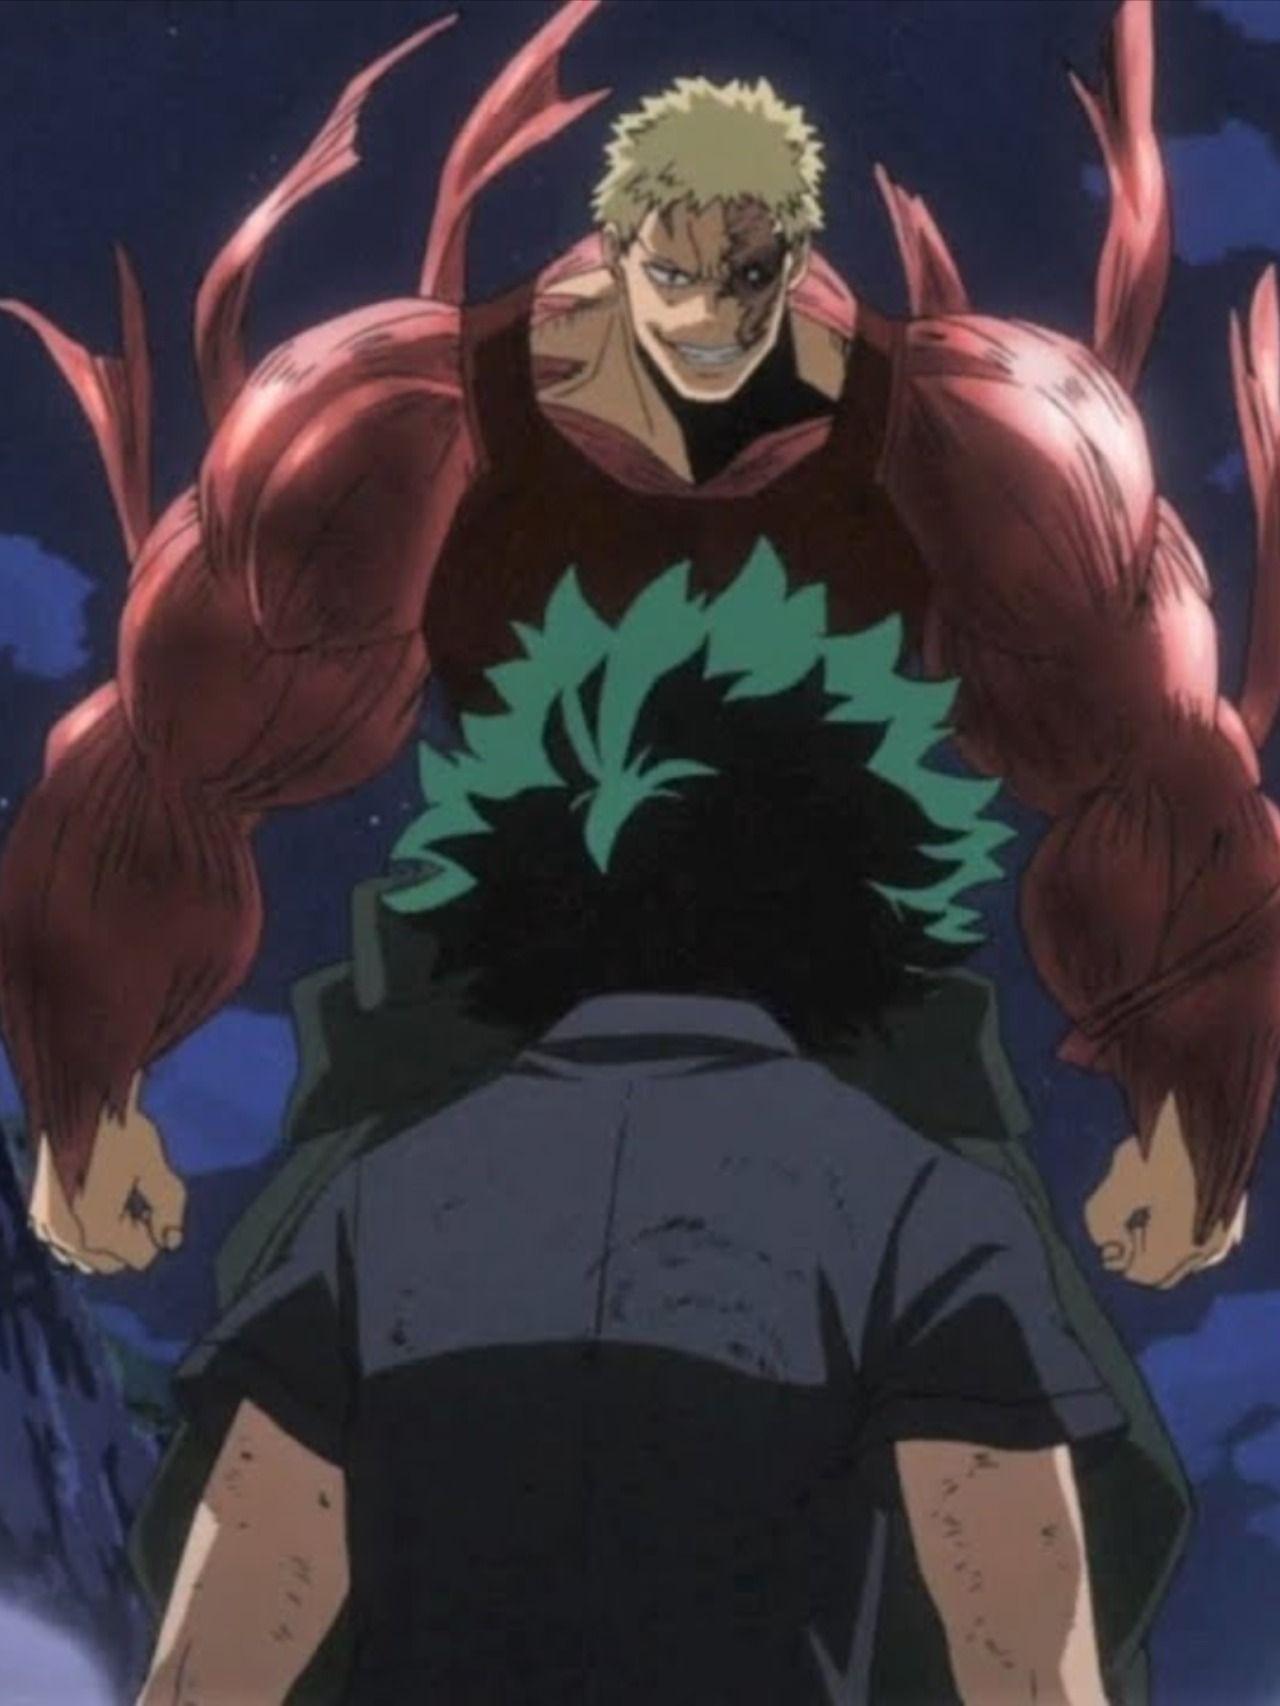 Muscular Anime My Hero Academia Birthday December 7 Anime Me Me Me Anime Anime Characters